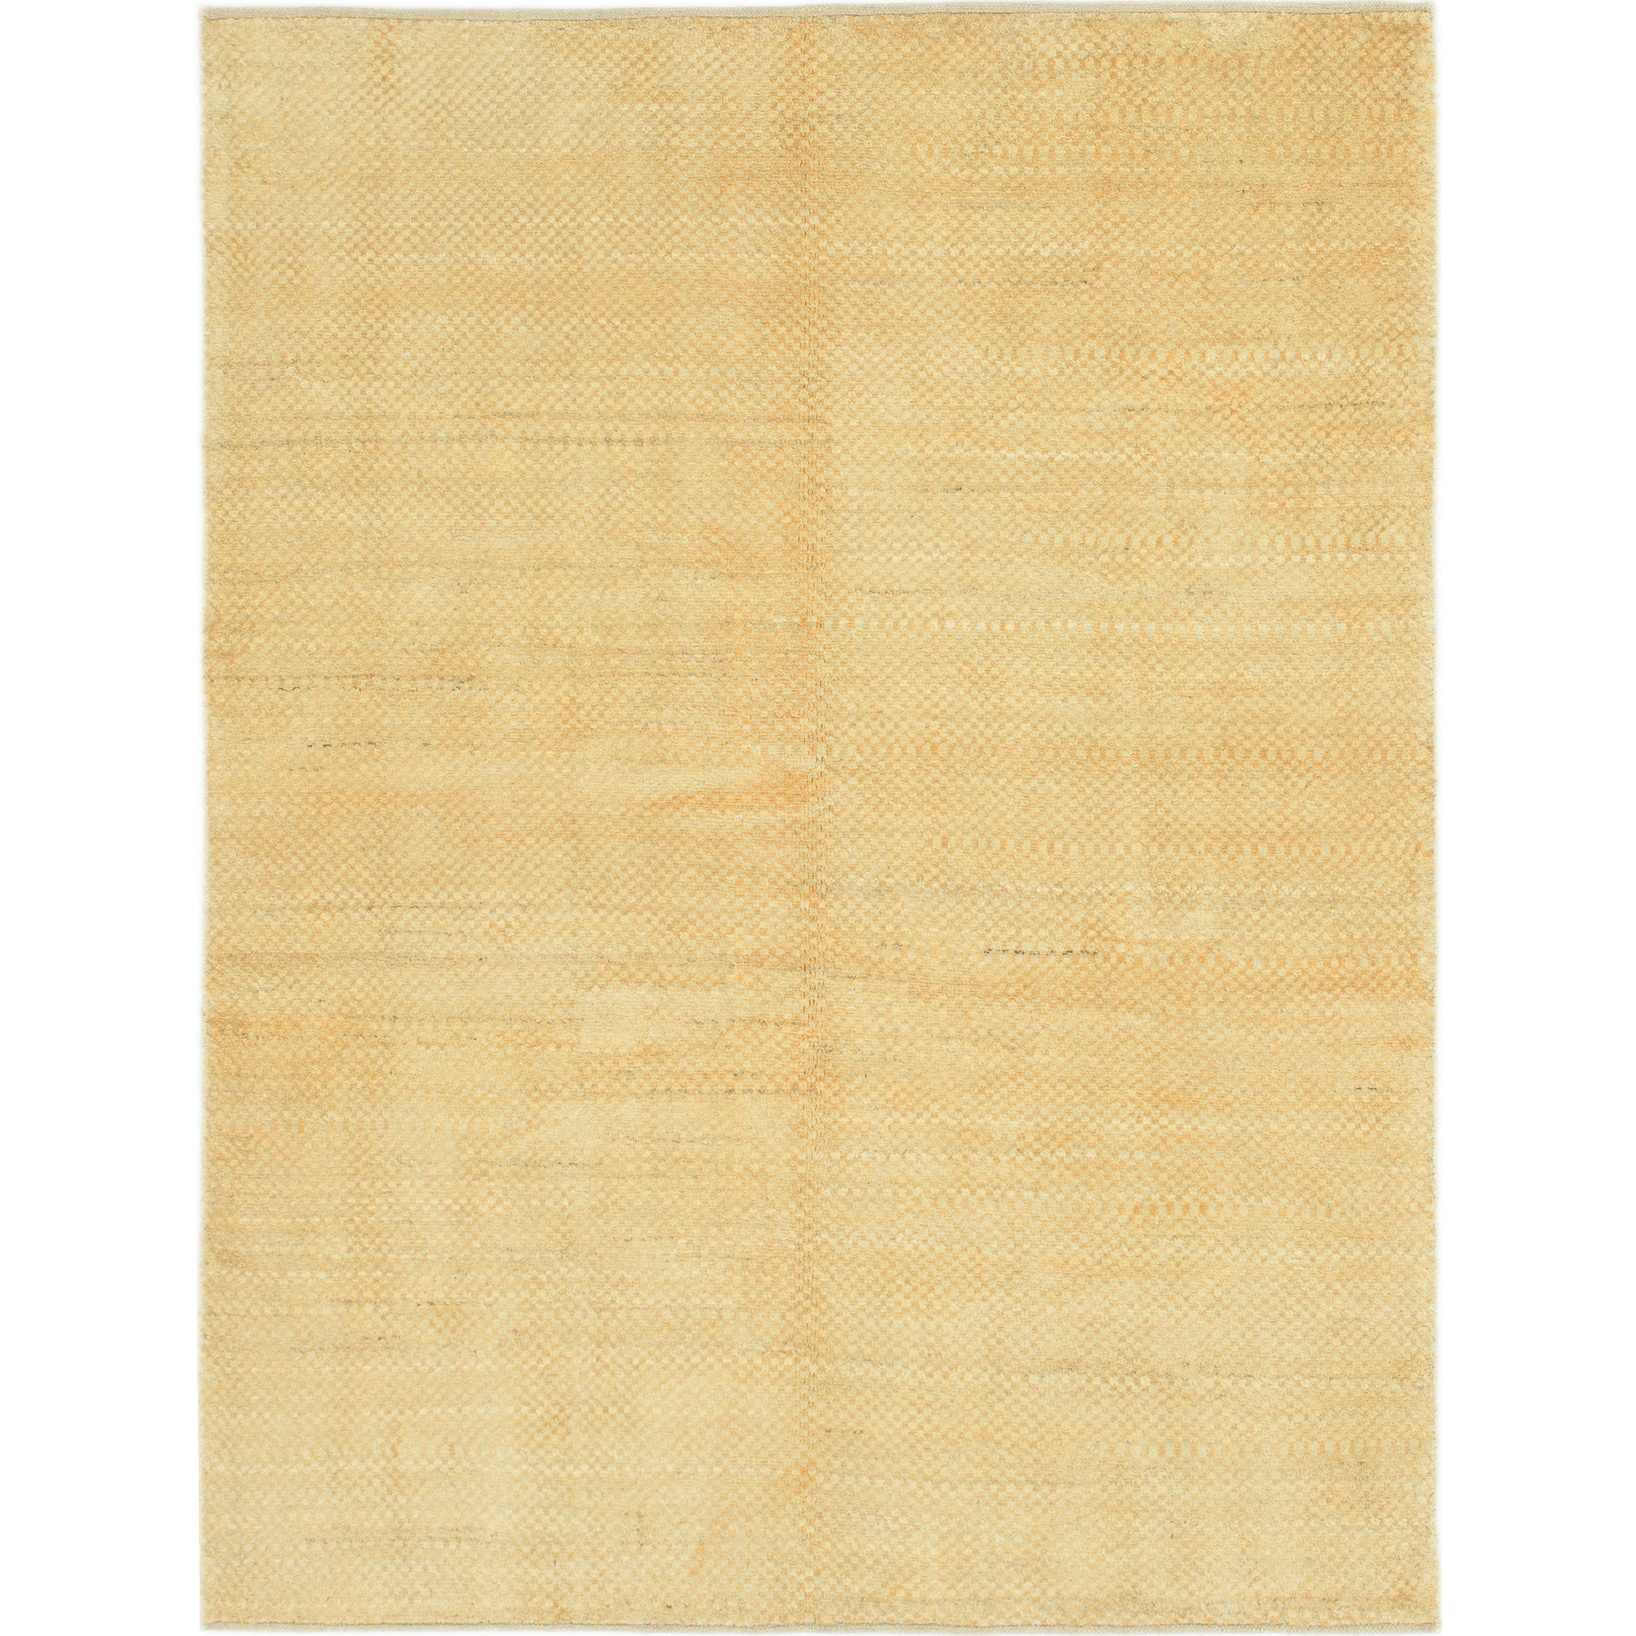 Hand Knotted Kashkuli Gabbeh Wool Area Rug - 4 10 x 6 5 (Gold - 4 10 x 6 5)